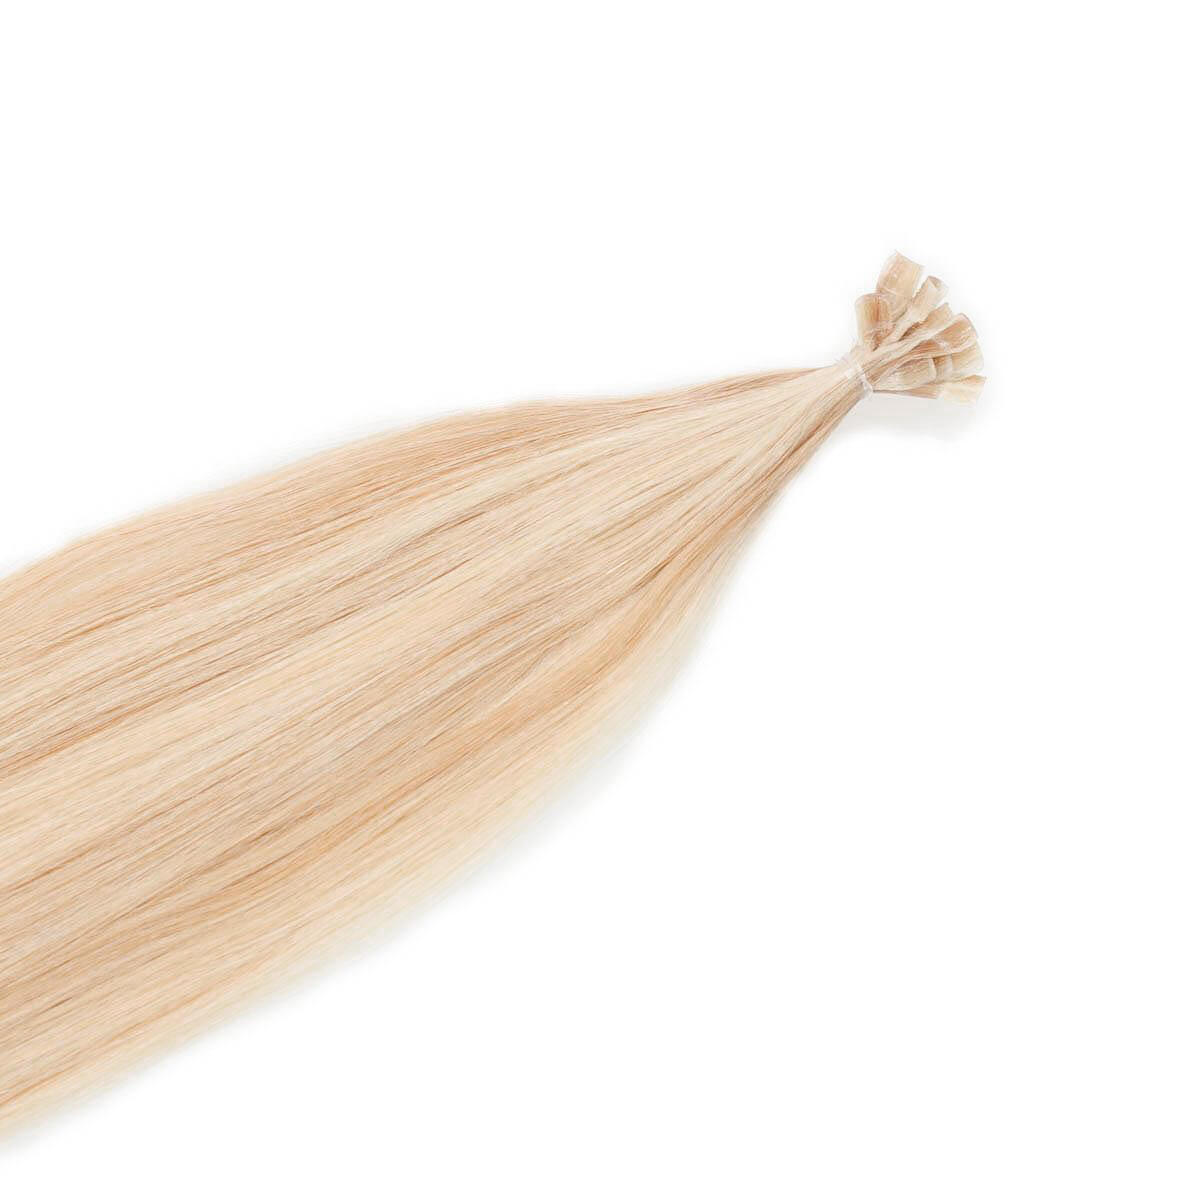 Nail Hair Premium M7.5/10.8 Scandinavian Blonde Mix 60 cm